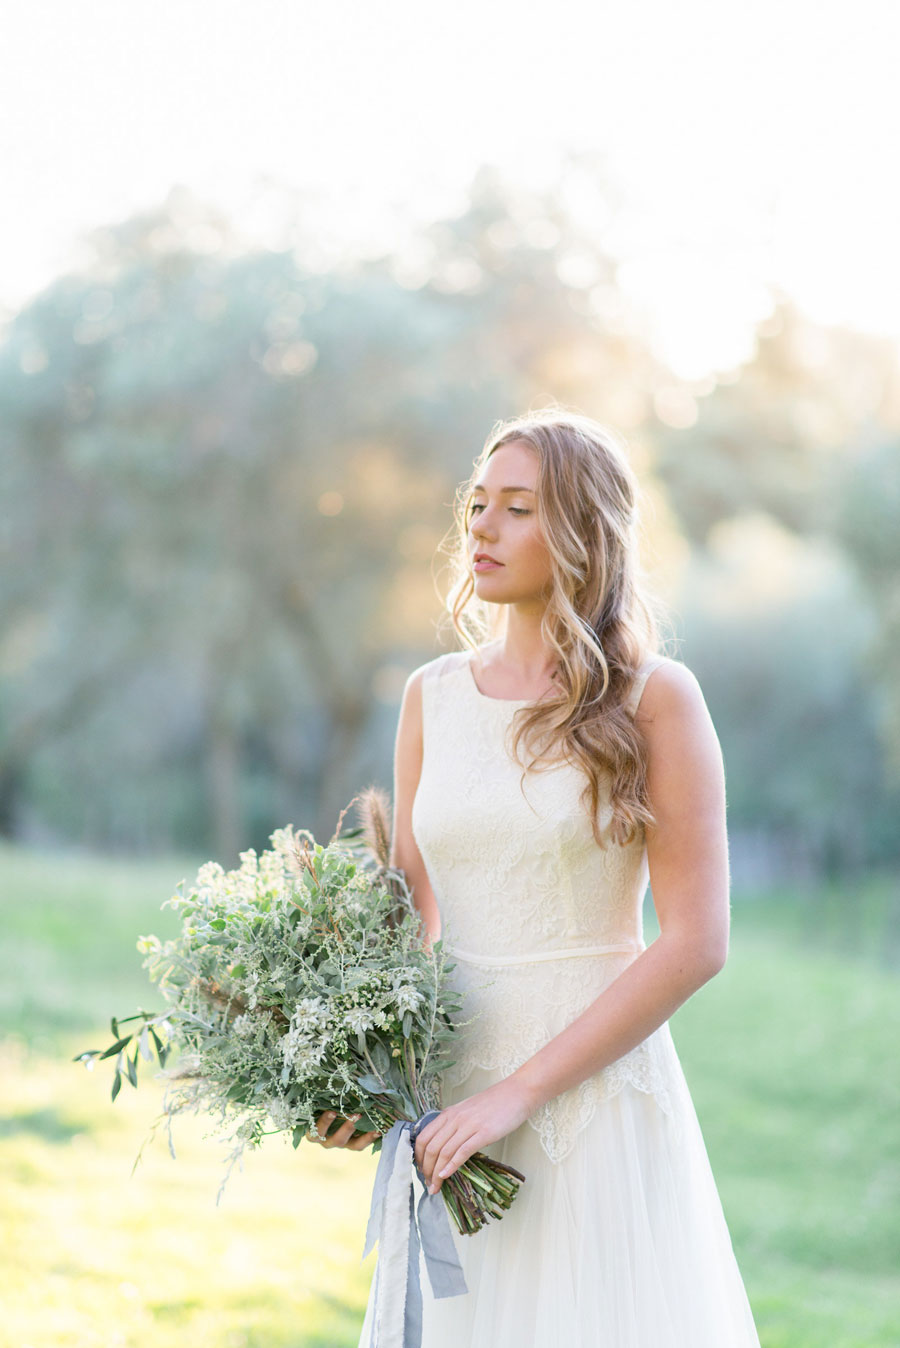 _Whitney-Heard-Photography-Wanderlust-Wedding-0862